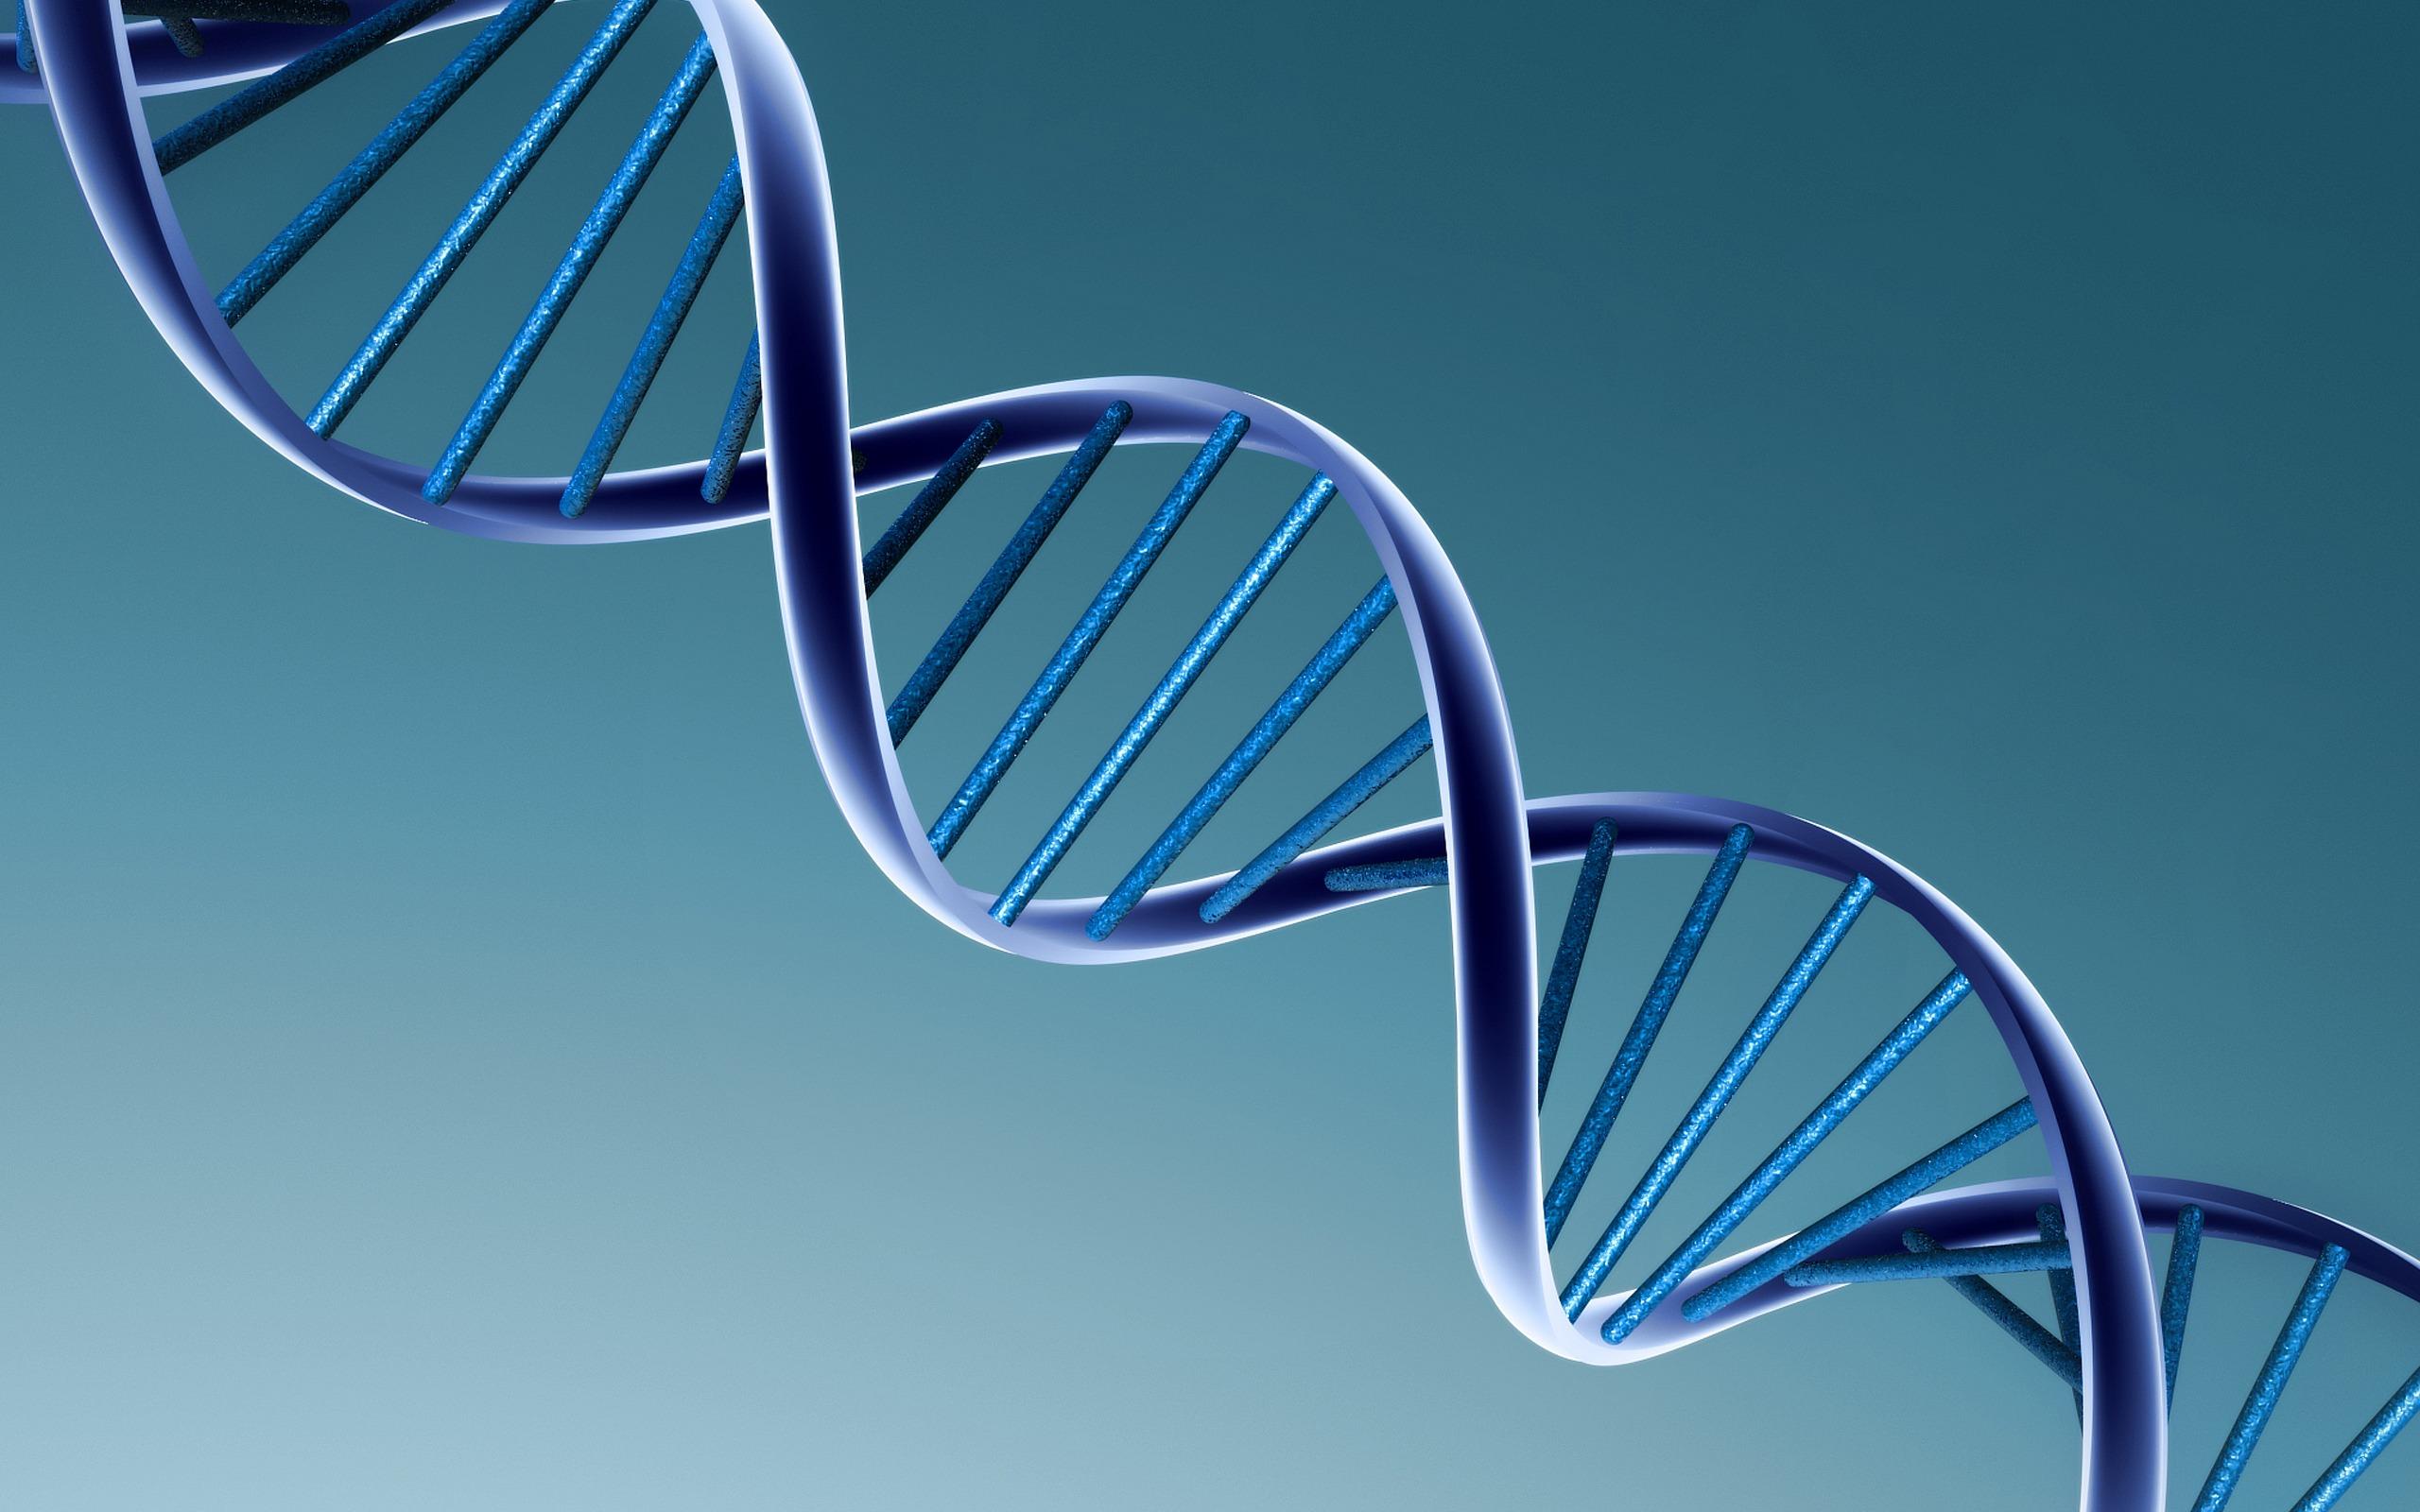 DNA Wallpaper 3D Models Wallpapers In Jpg Format For Free Download